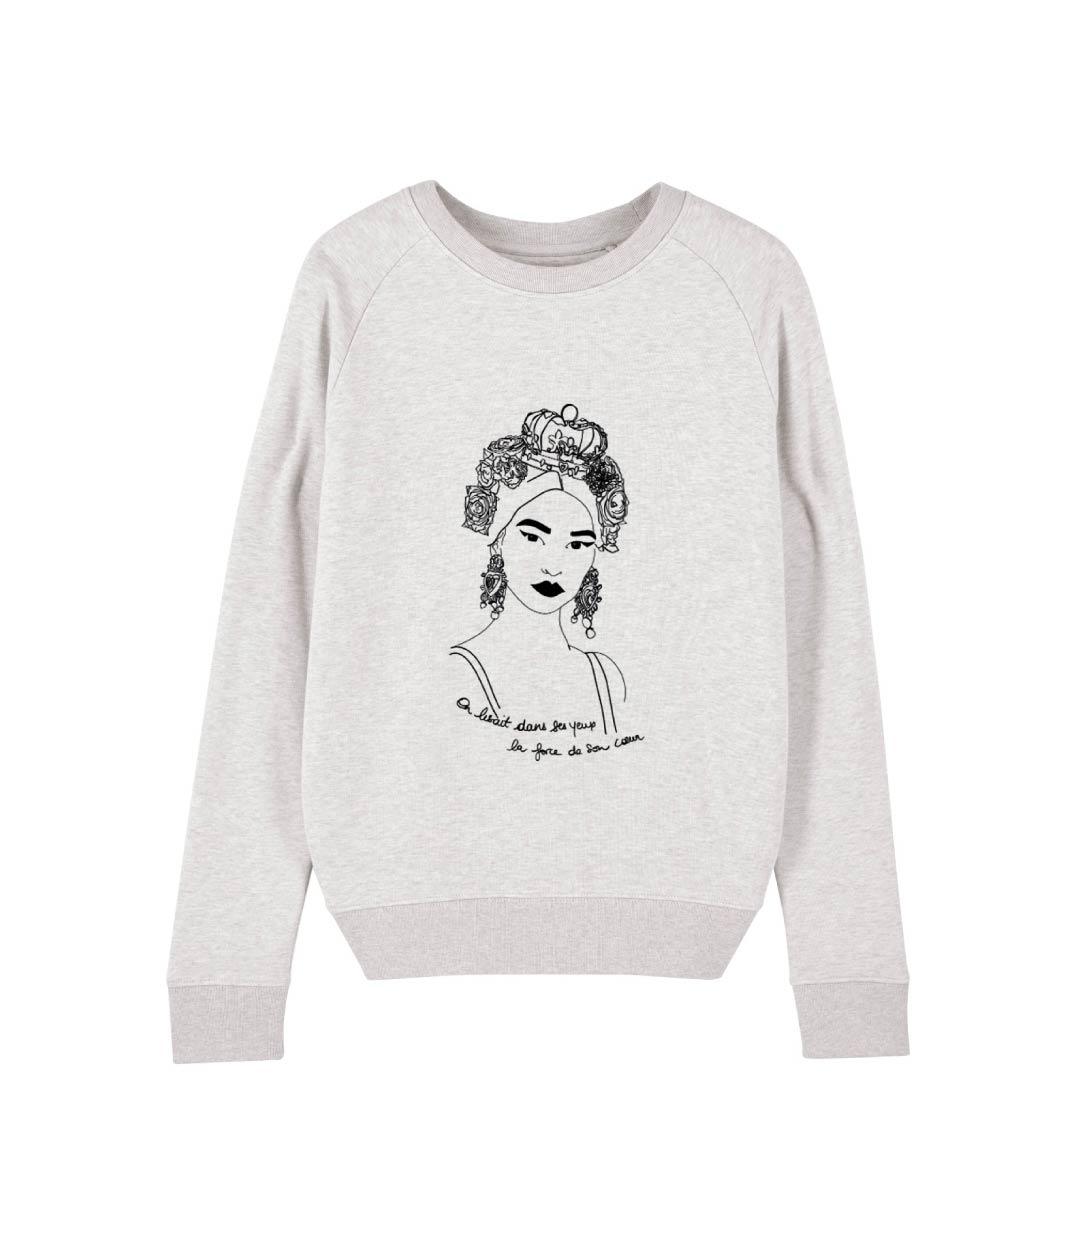 mock up sweatshirt crème esperanza leonor roversi